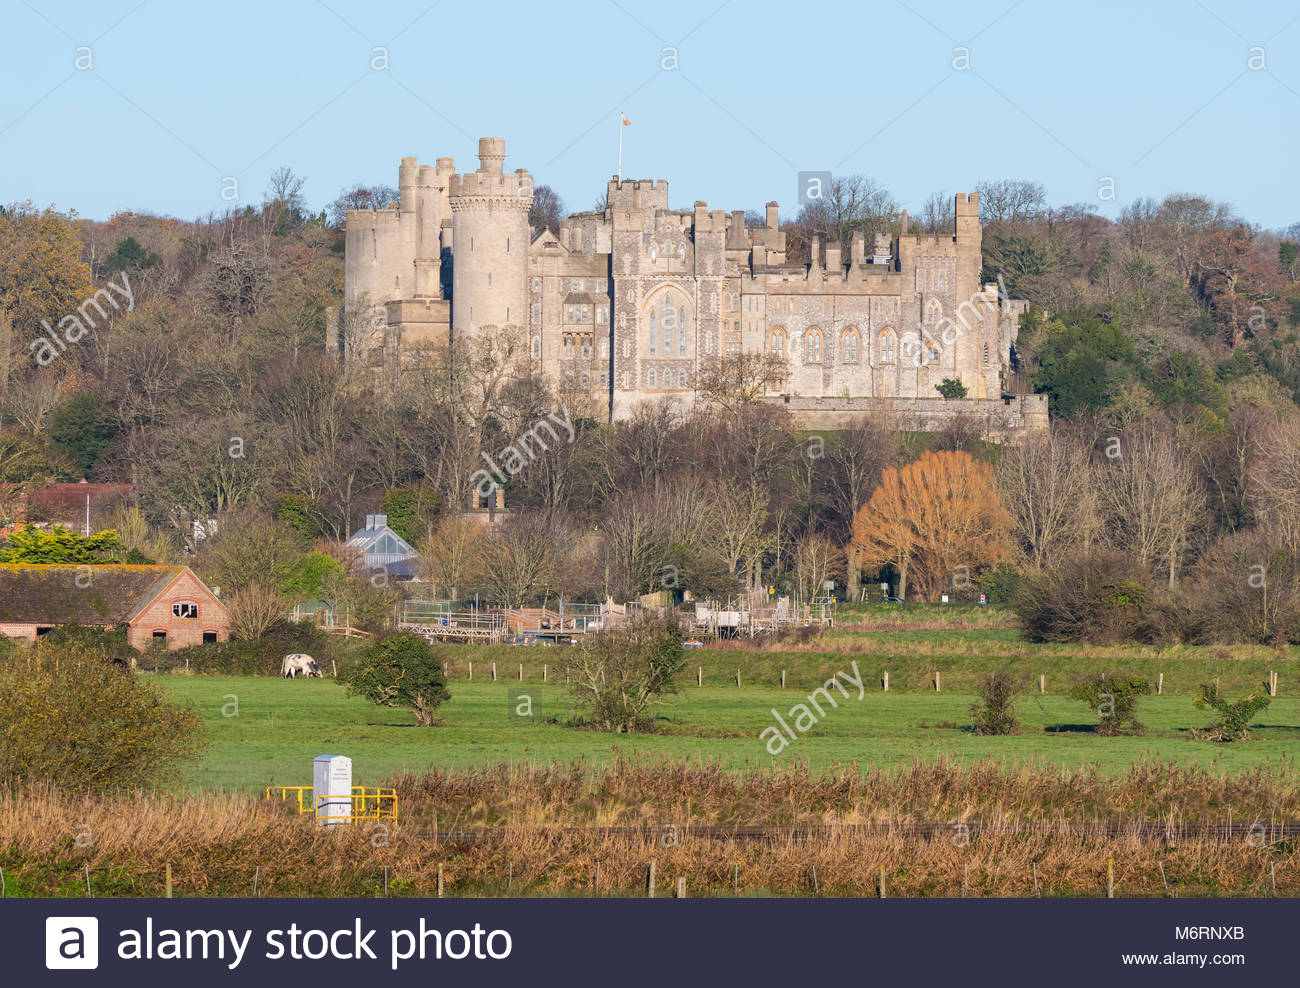 view-of-arundel-castle-view-from-fields-in-arundel-west-sussex-england-M6RNXB.jpg